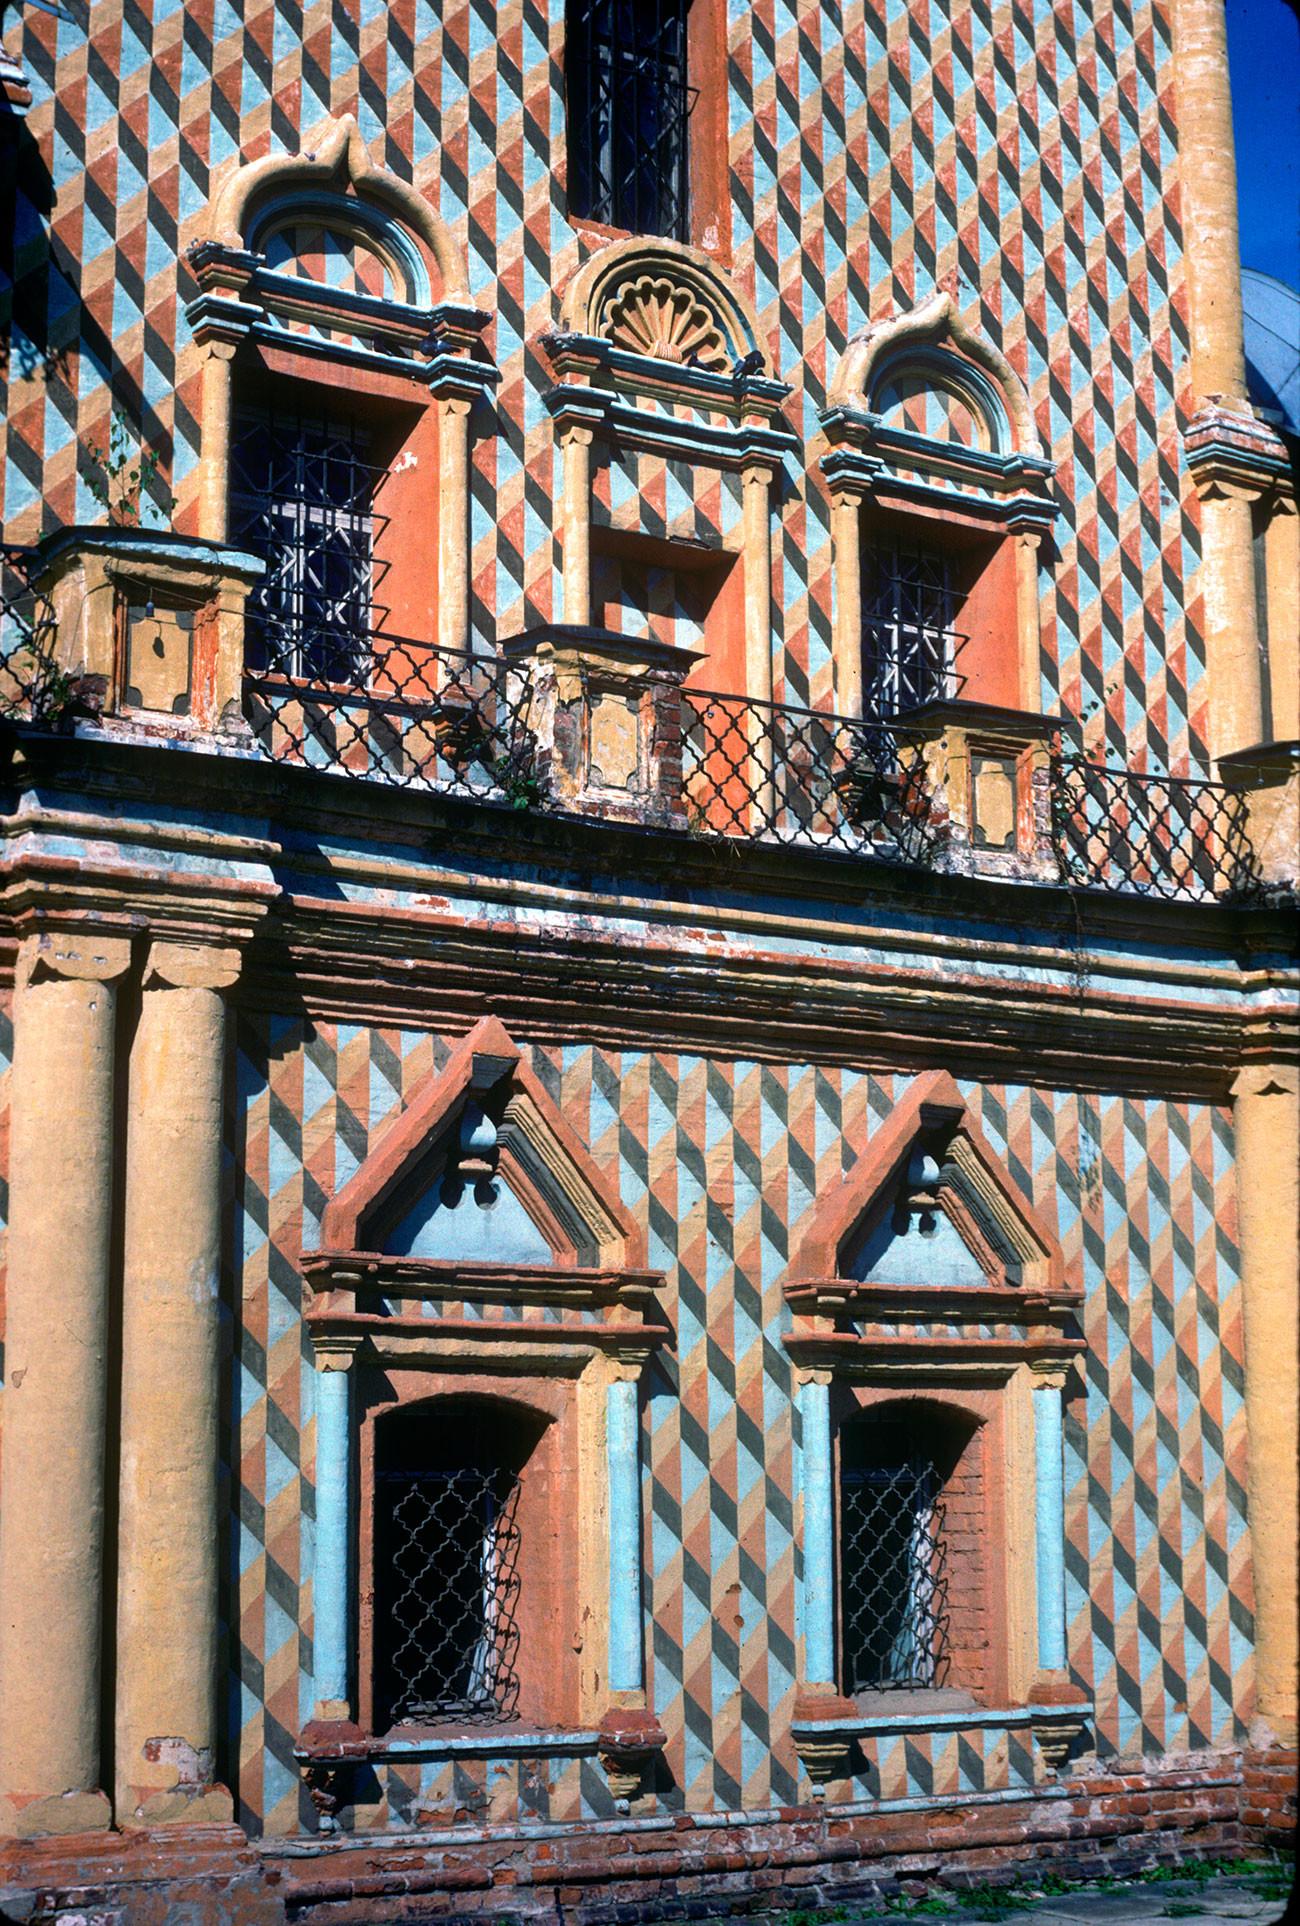 Kremlin de Rostov. Iglesia del Icono de Odighitria, fachada sur, detalles de la ventana. 21 de agosto de 1988.